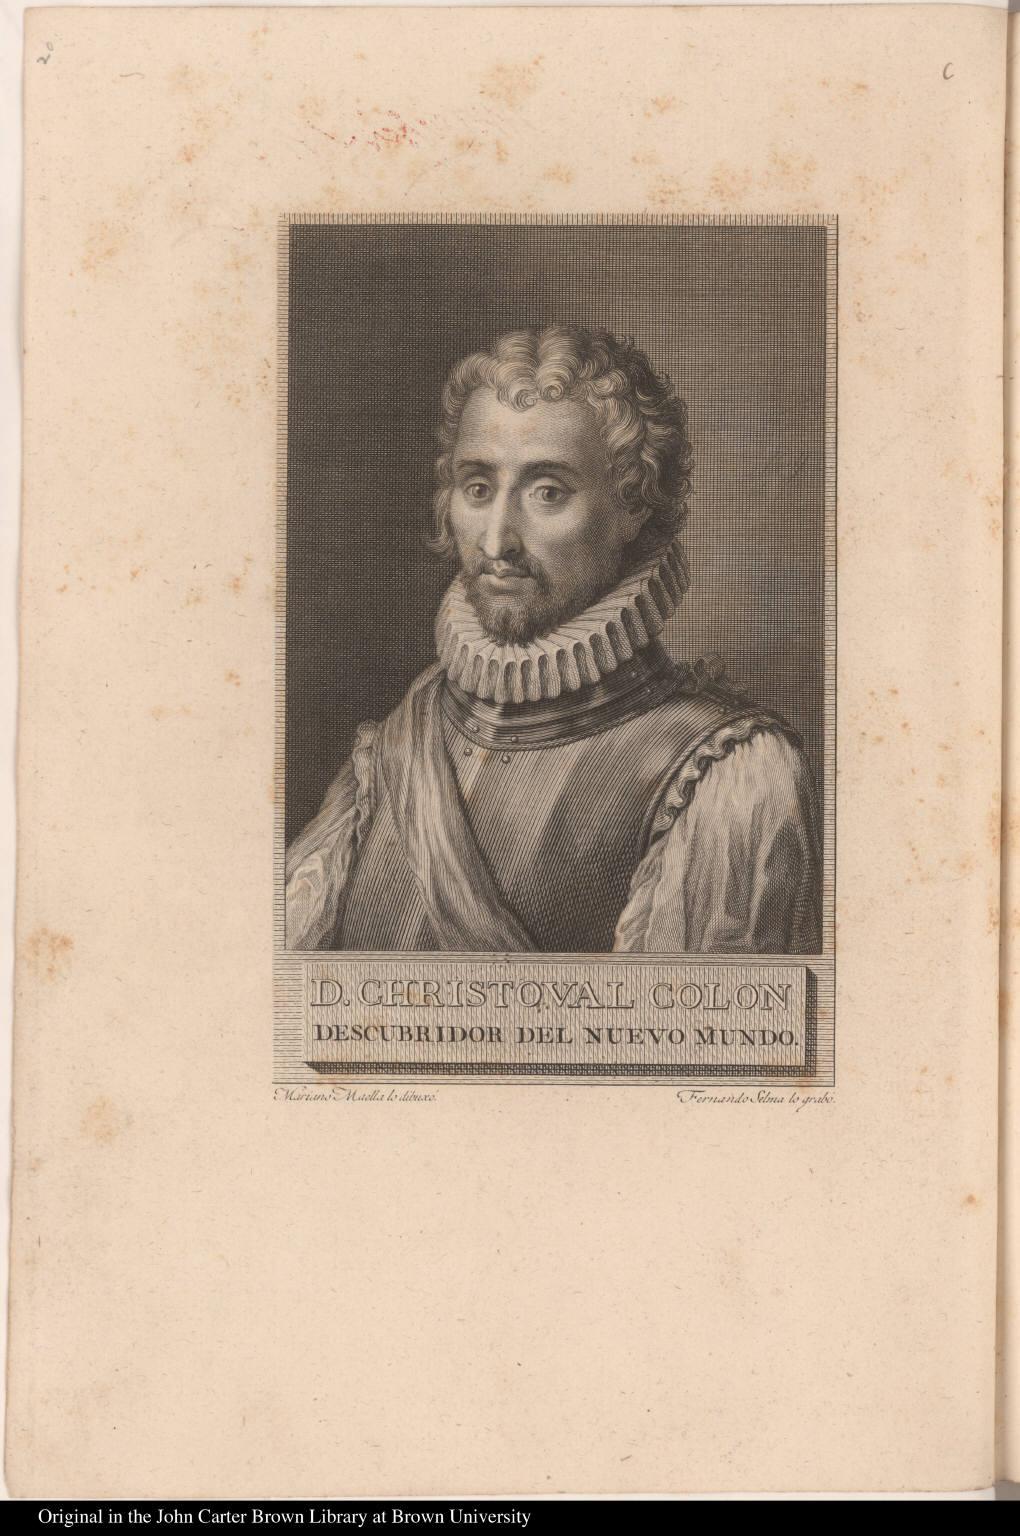 D. Christoval Colon descubridor de Nuevo Mundo.